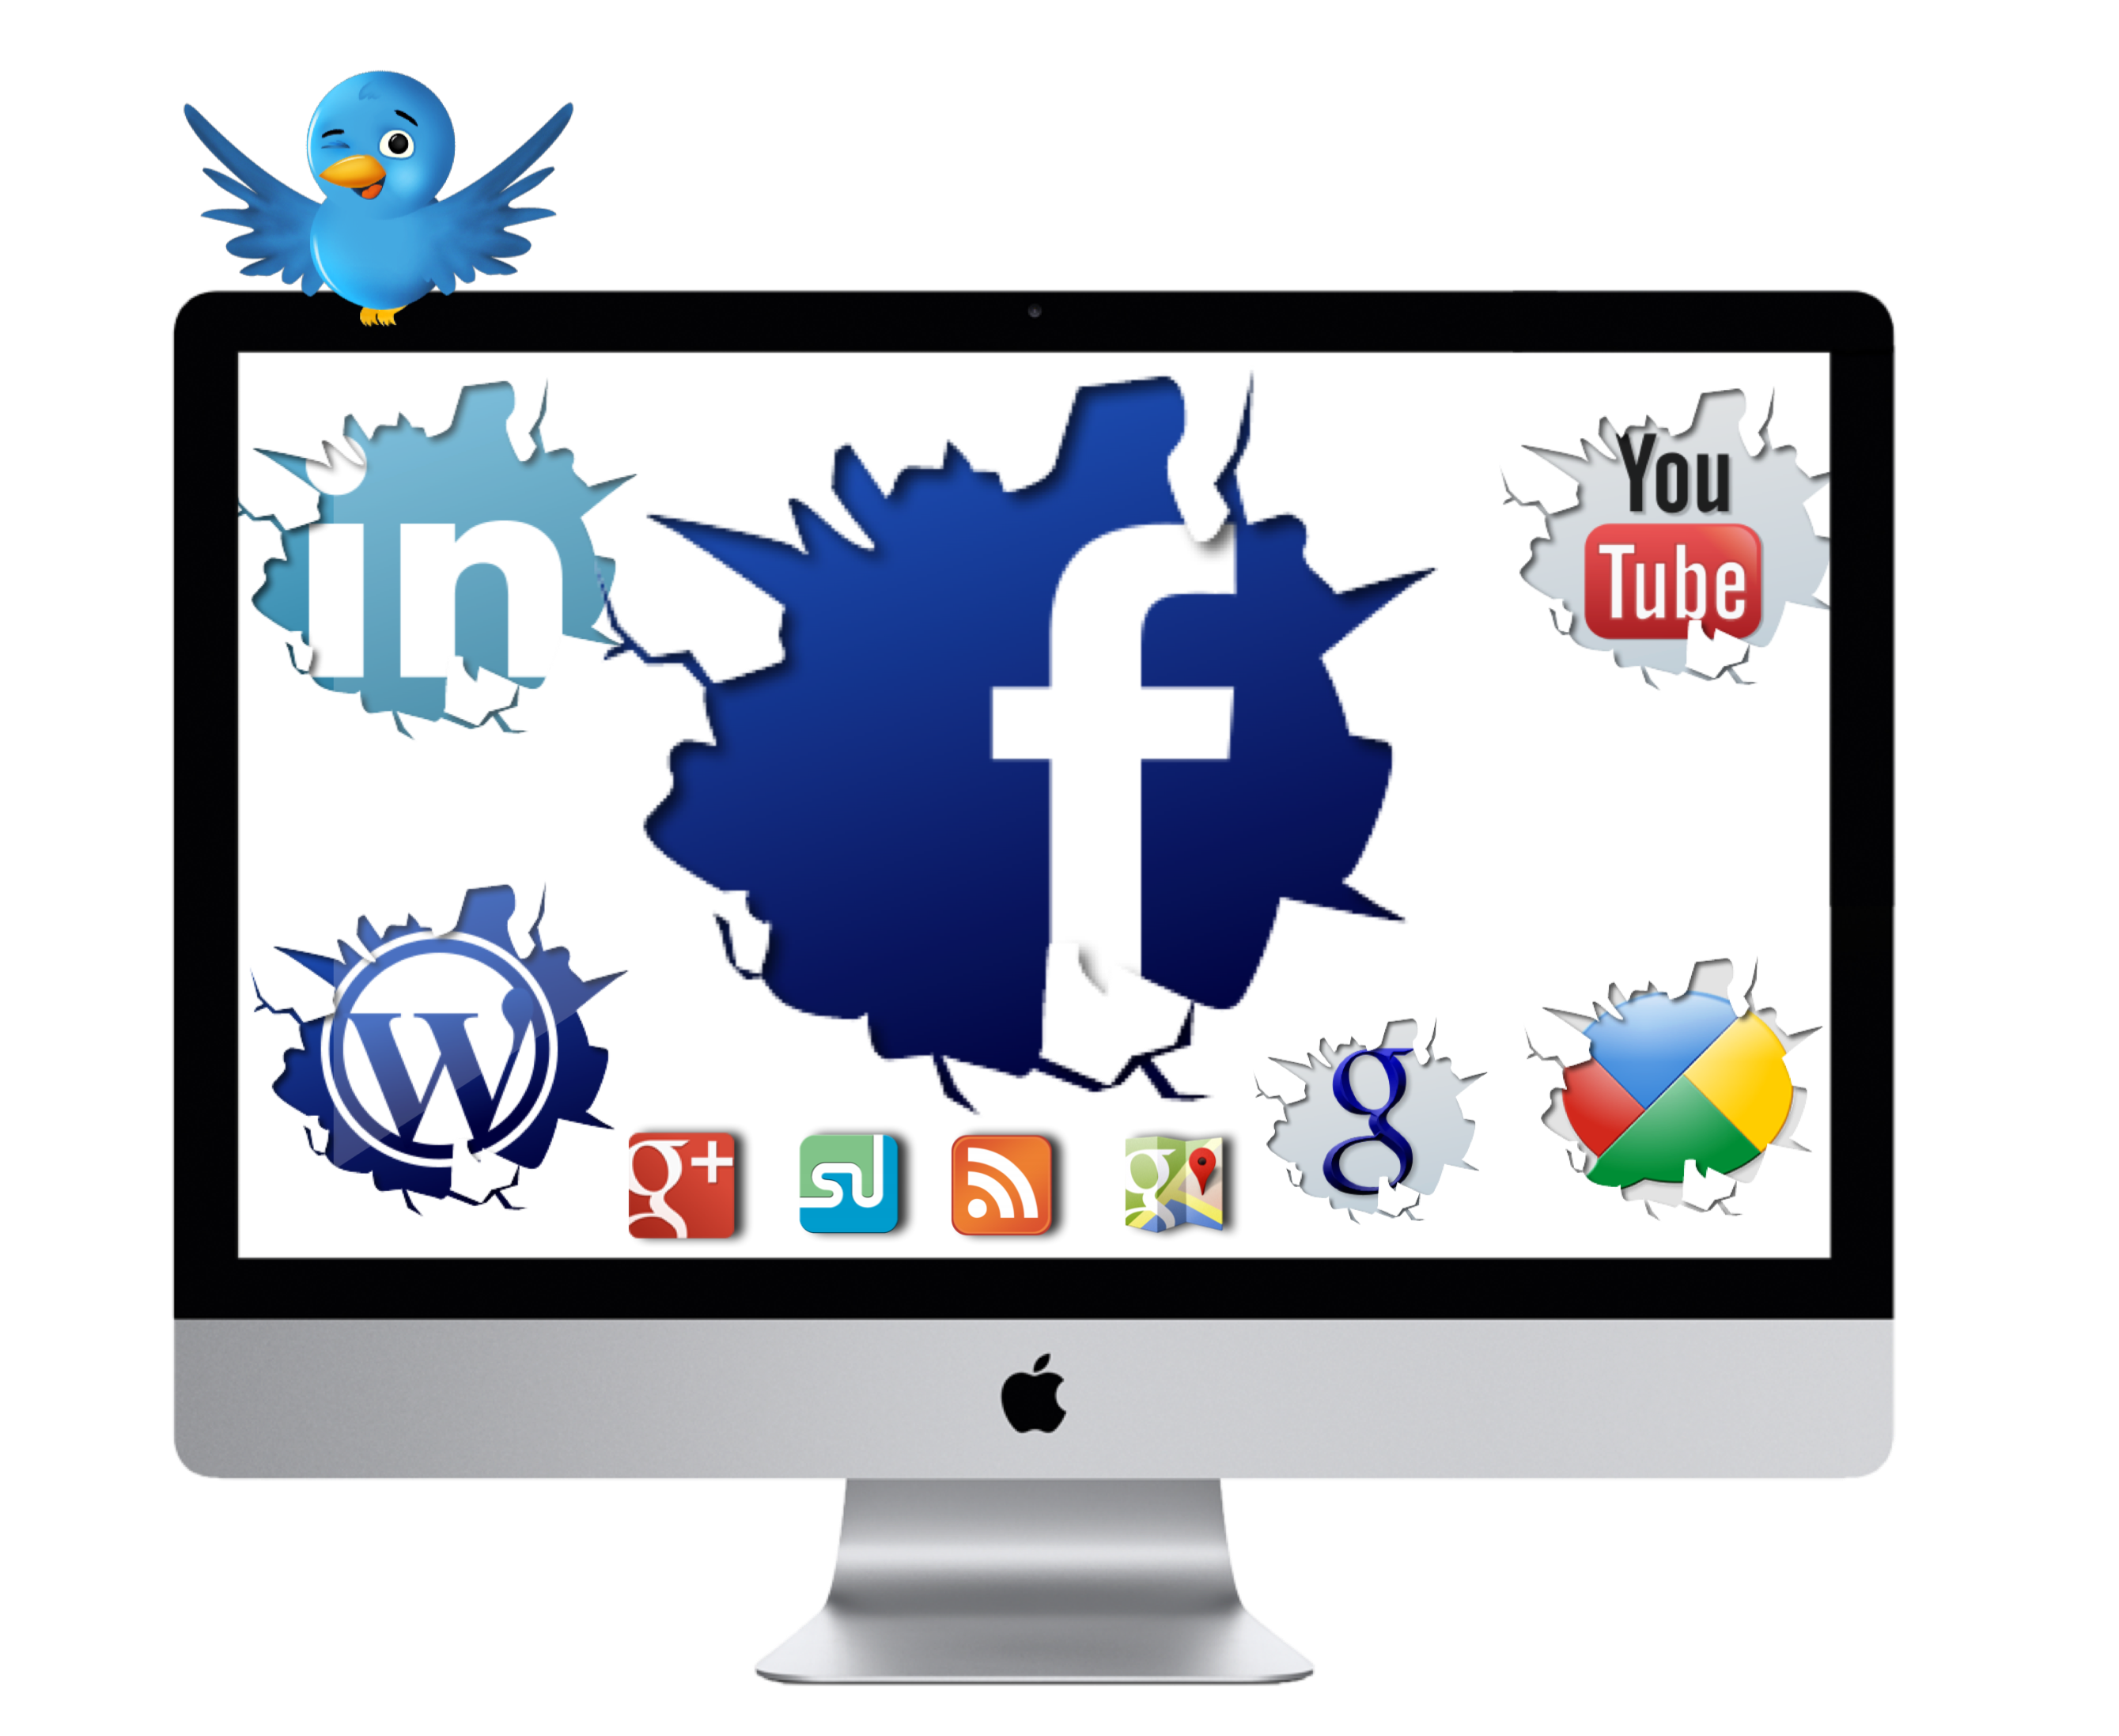 Social Media Mac Apple HD For Wallpapers 3960 Wallpaper 2679x2195